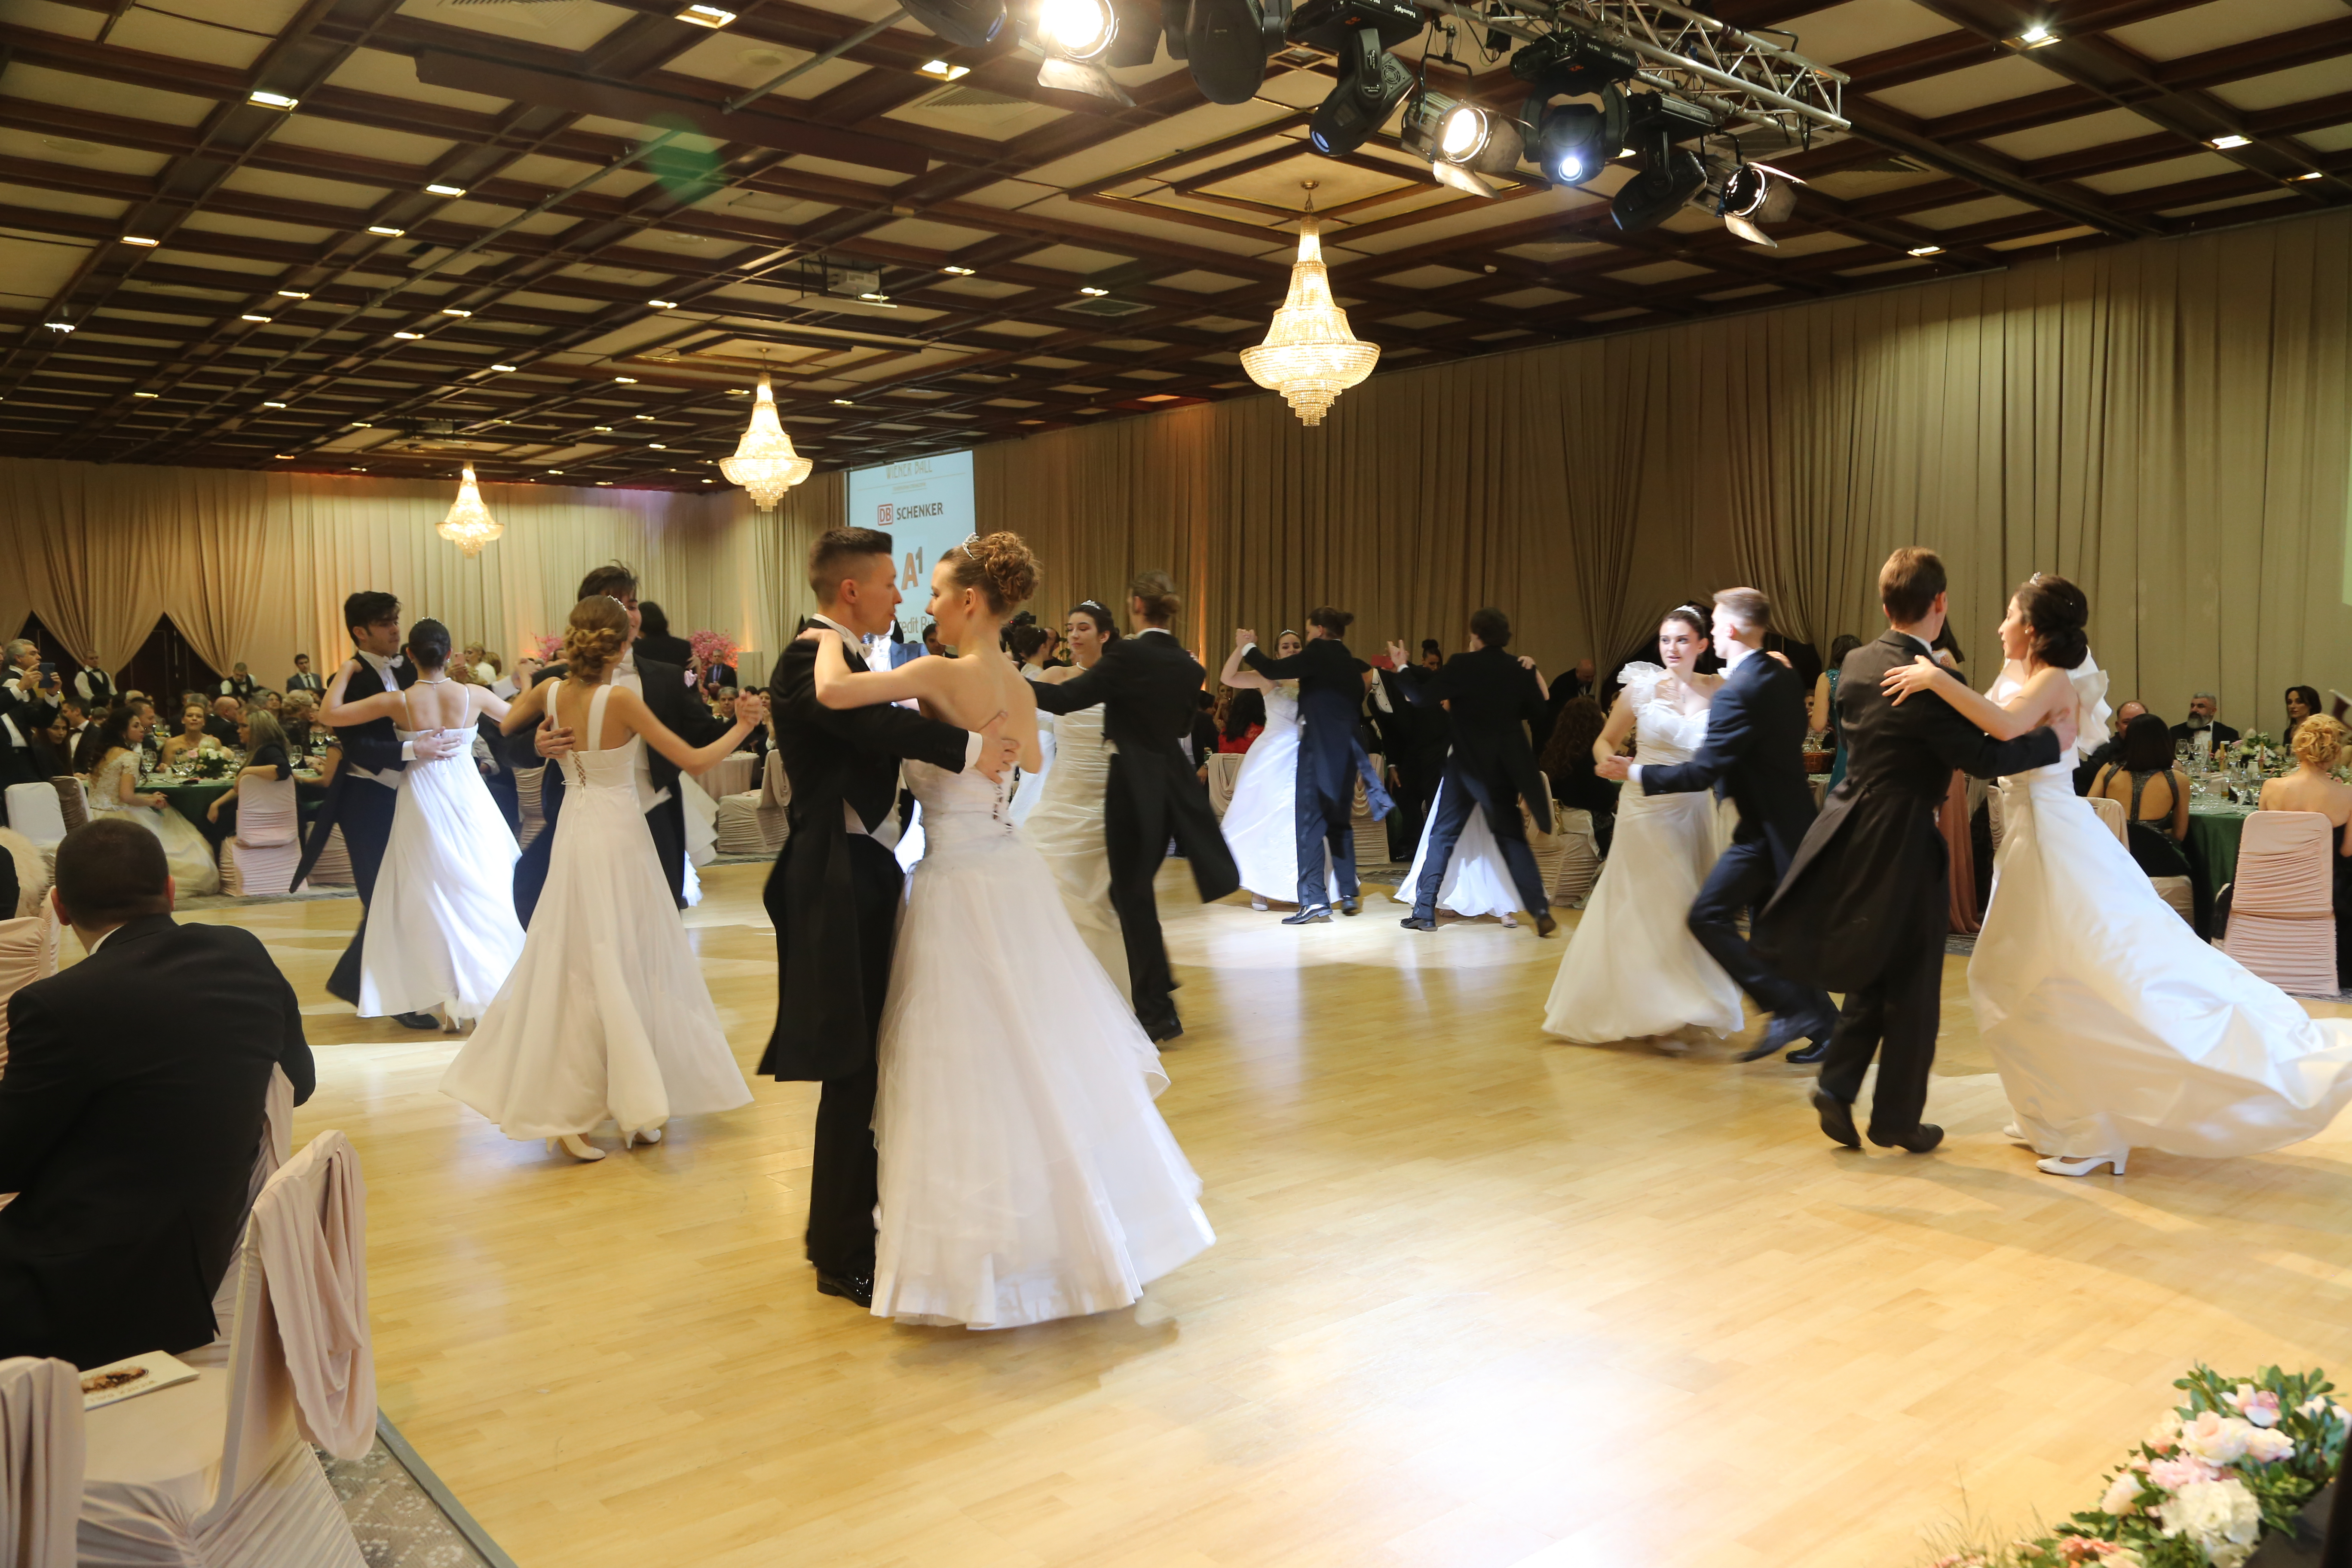 attachments/events/VienskiBal2019/IMG_2015.JPG